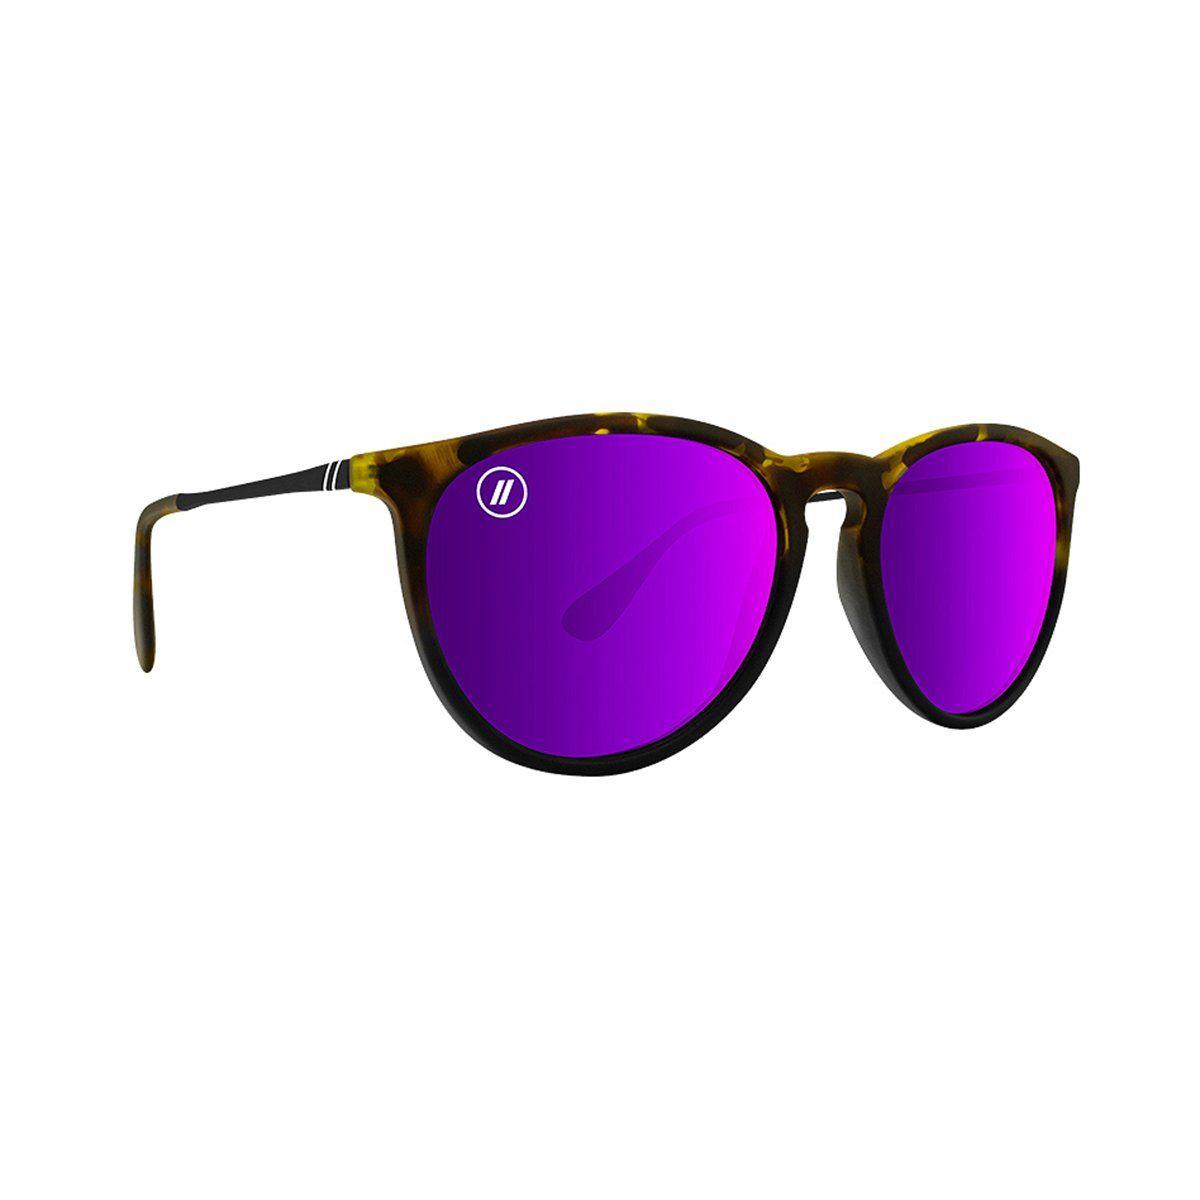 35ca8eb6c1 ... coupon for oakley blender sunglasses with hd optics 725de ac66b